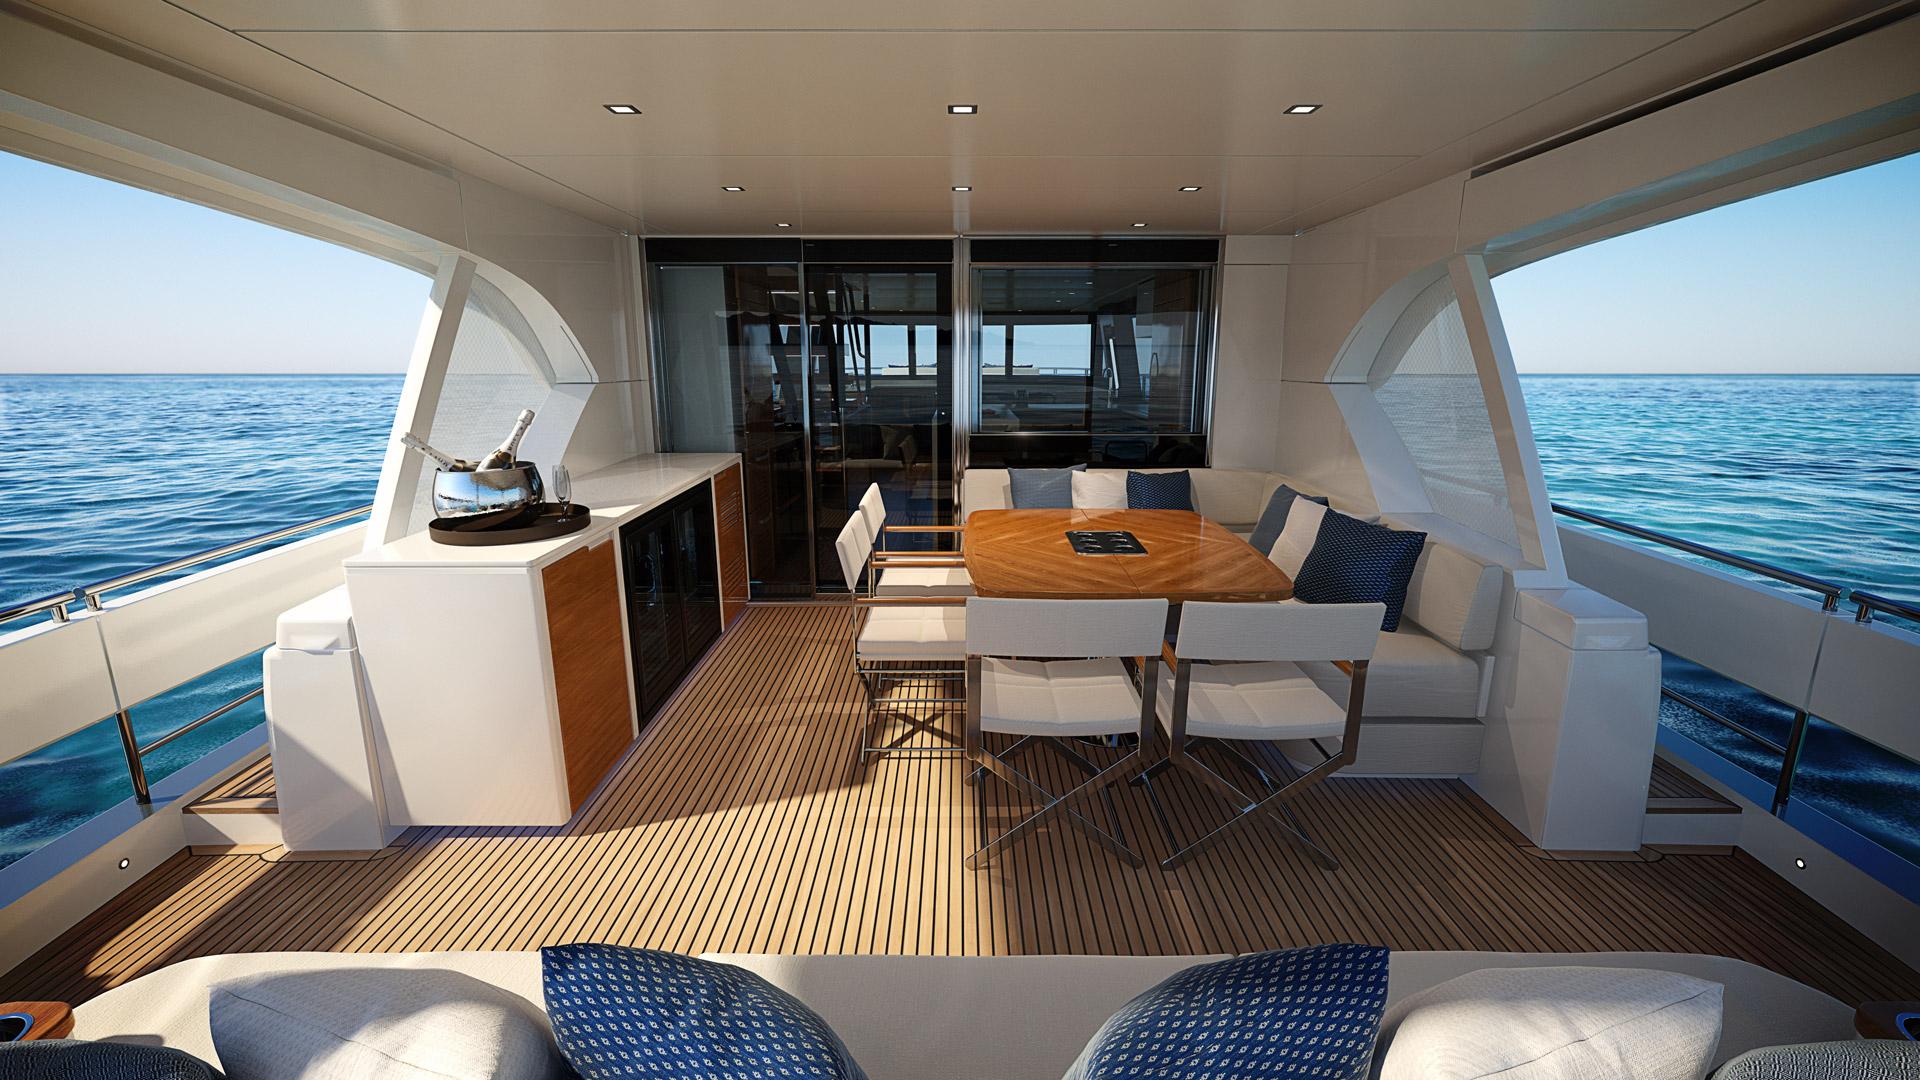 alfresco dining area aboard the Riviera 78 motor yacht